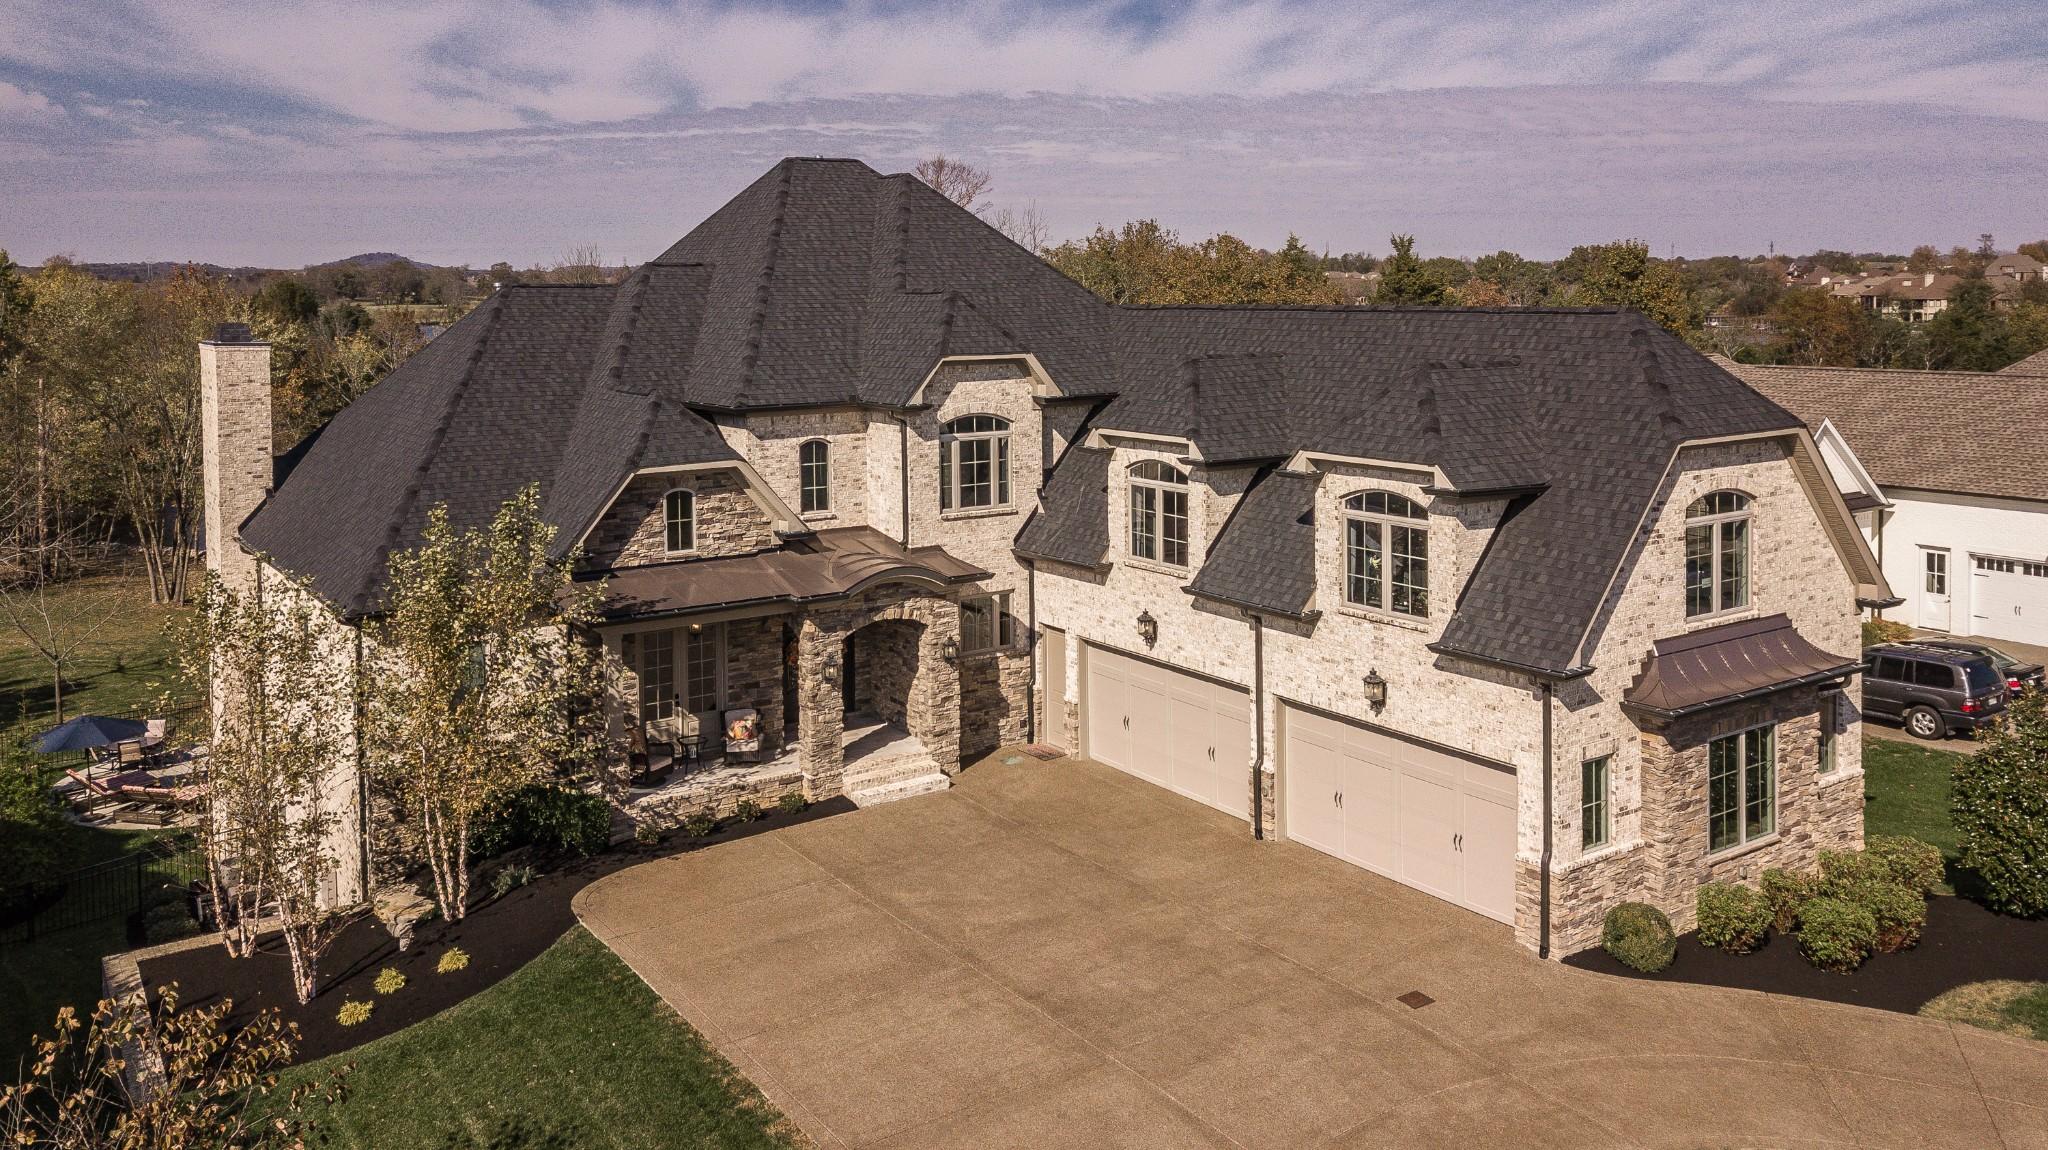 1435 Boardwalk Pl, Gallatin, TN 37066 - Gallatin, TN real estate listing